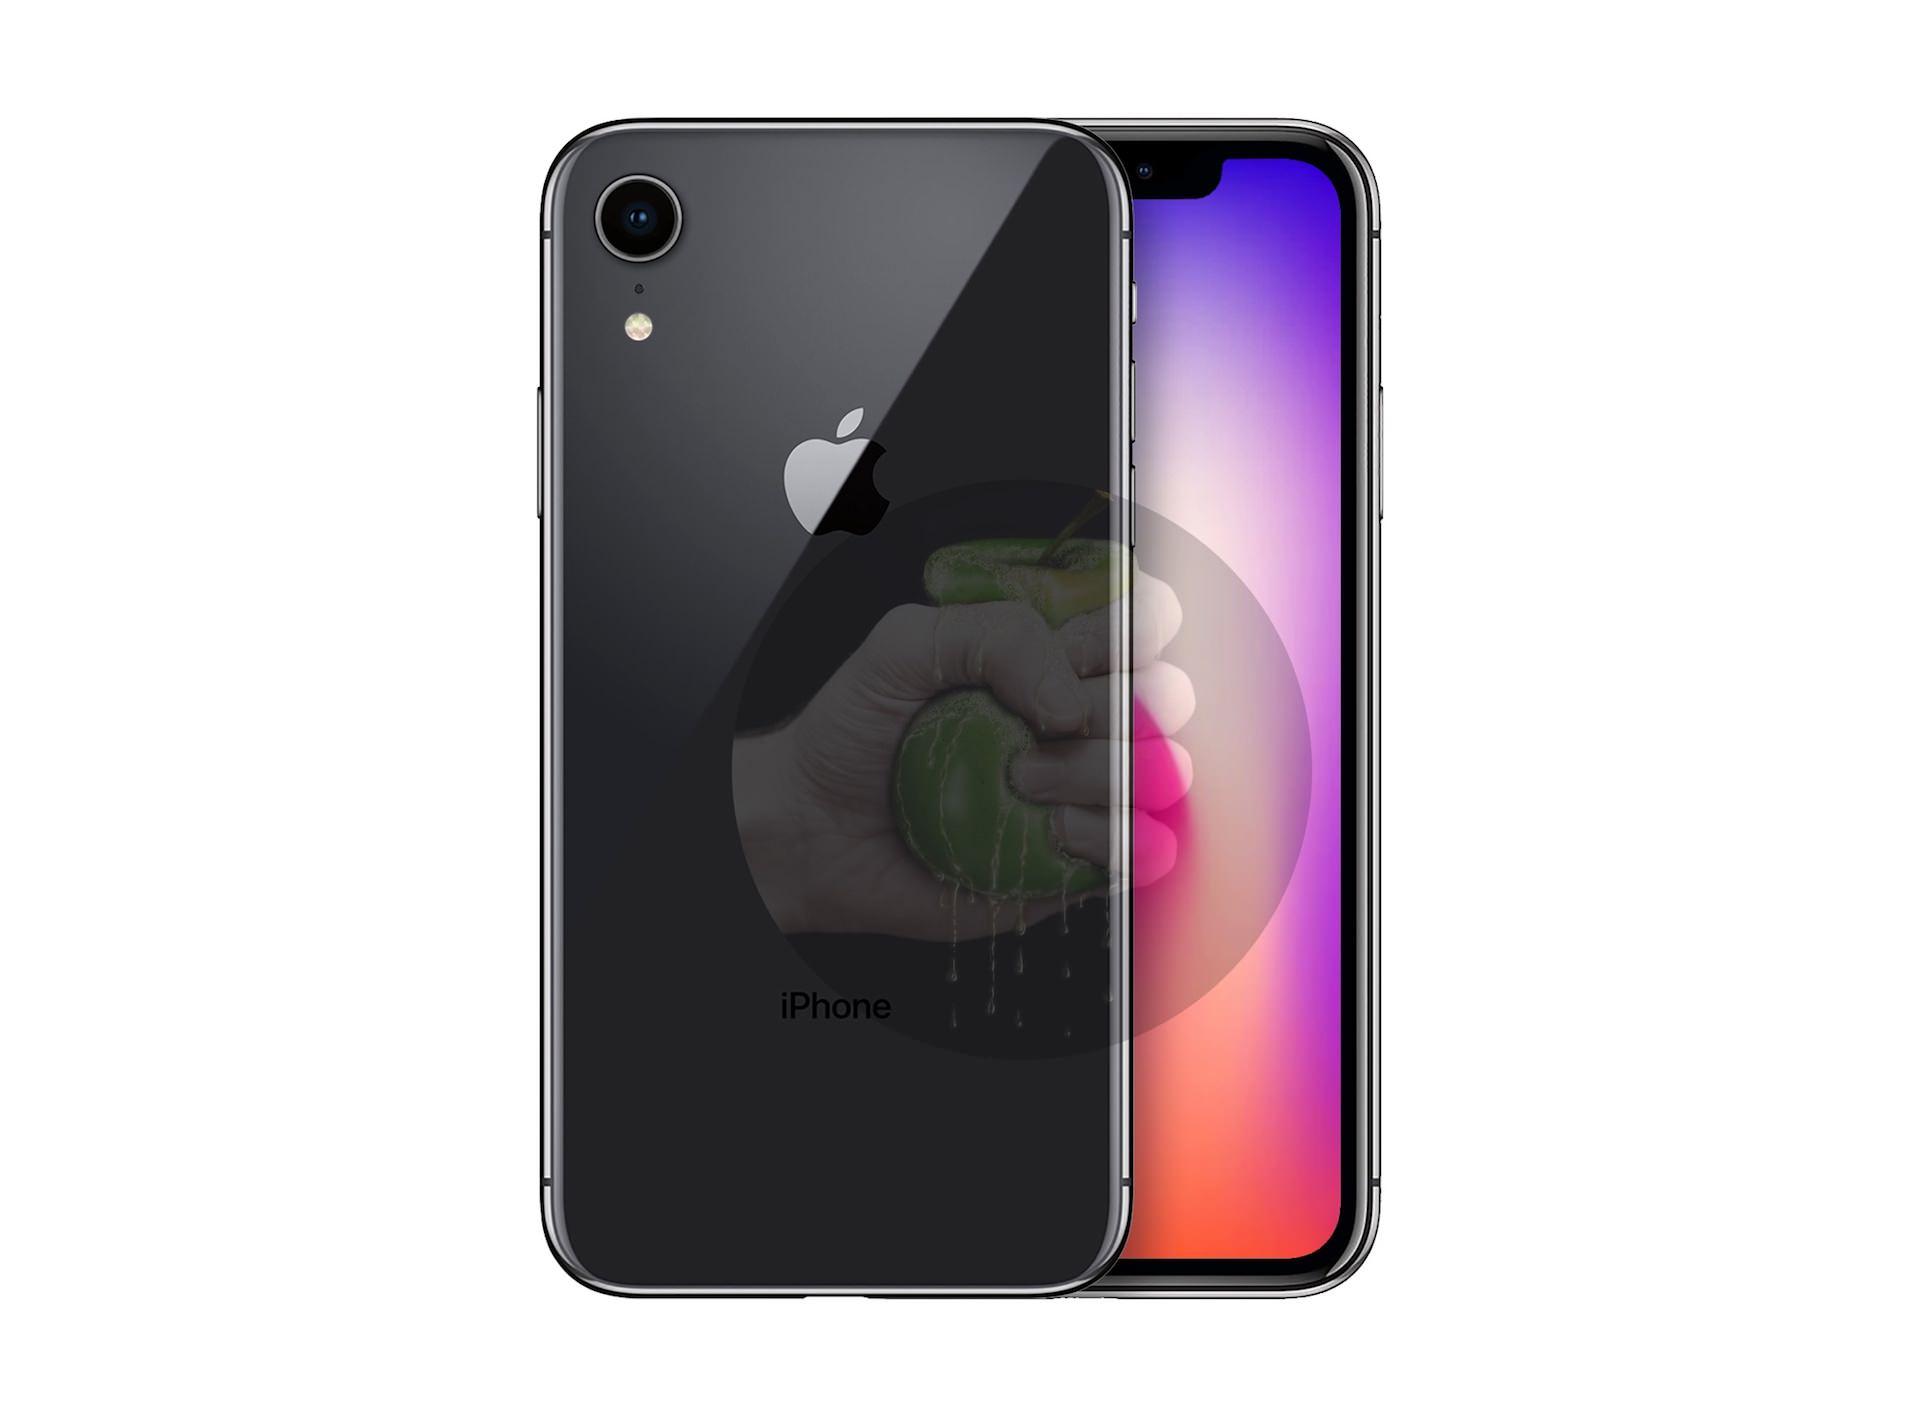 iPhone-9-wylsacom-6.jpg